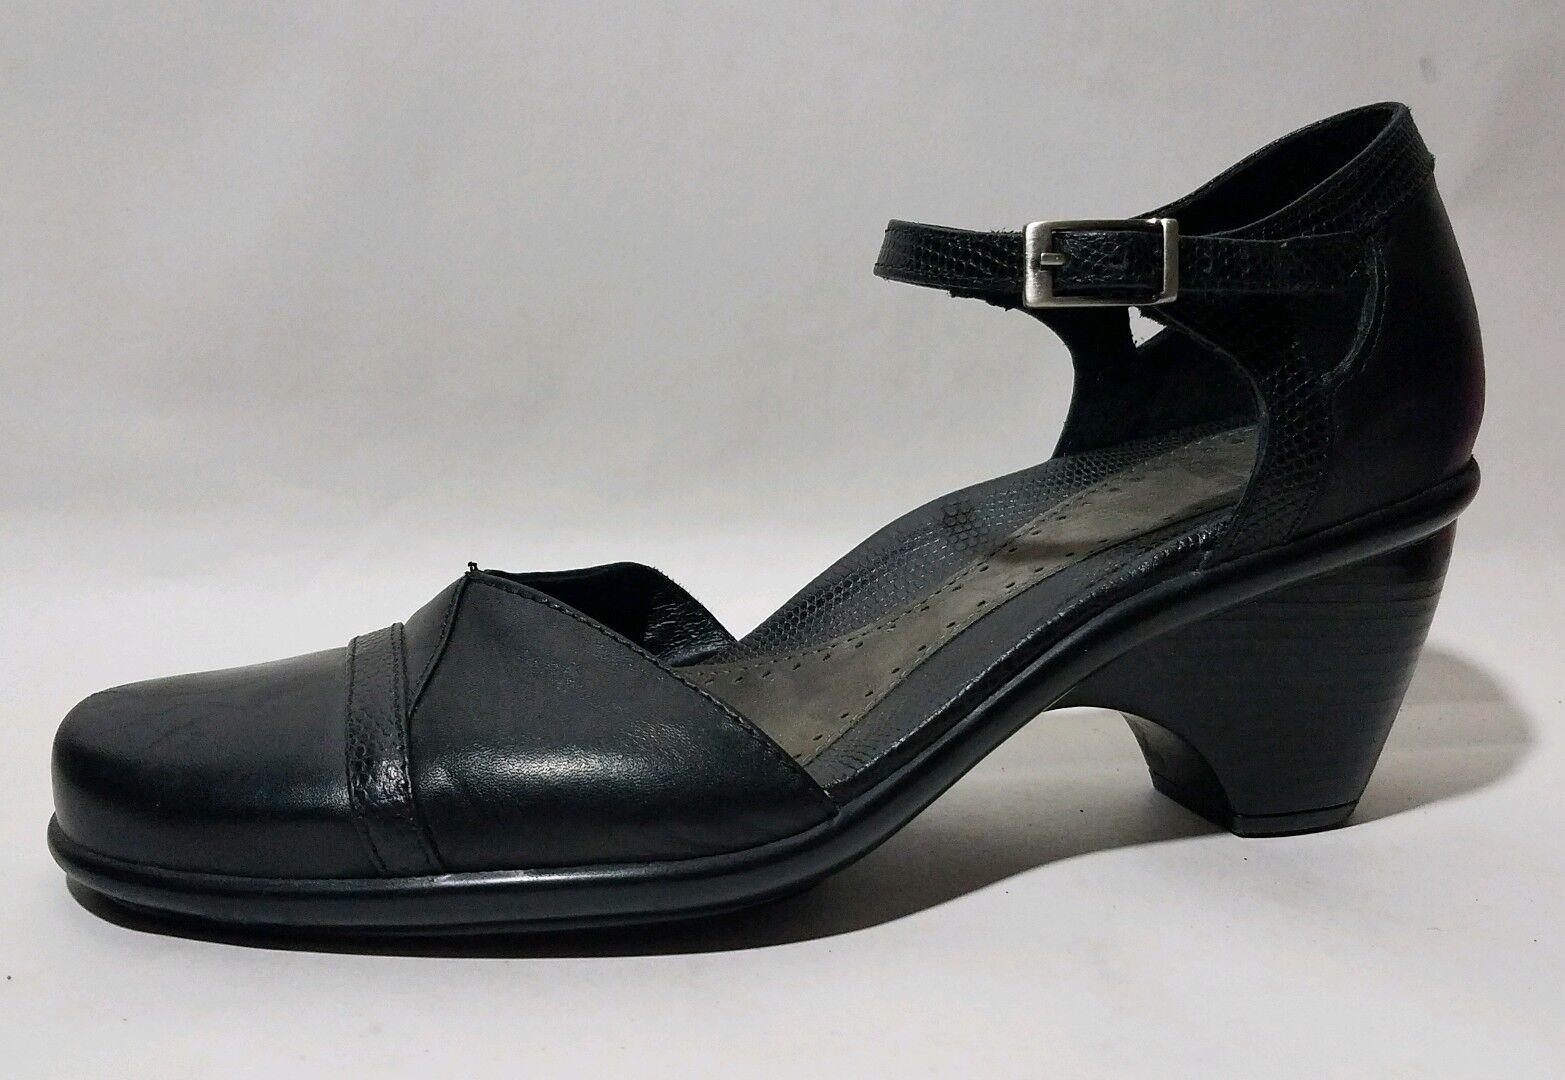 DANSKO ROXY Womens 7.5 - 8 Med Black Calf Leather Ankle Strap Shoes Heels